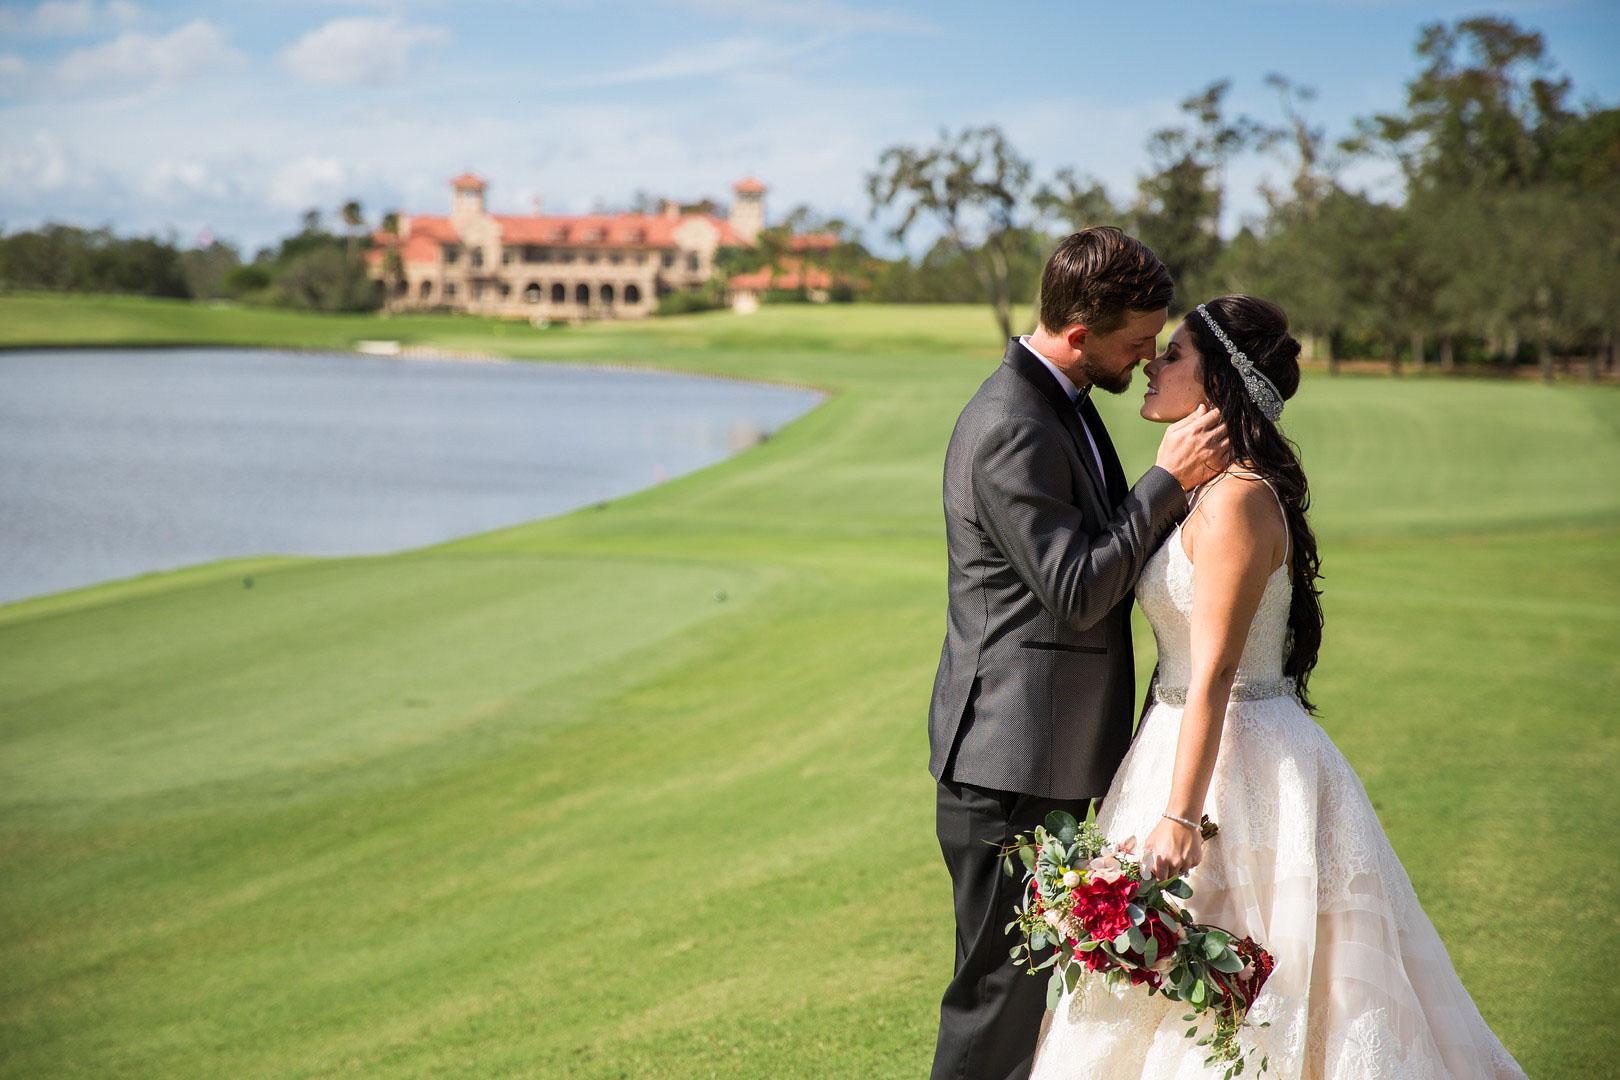 Clubhouse-TPC-Sawgrass-Wedding-Photographer-Adam-Szarmack-47.jpg